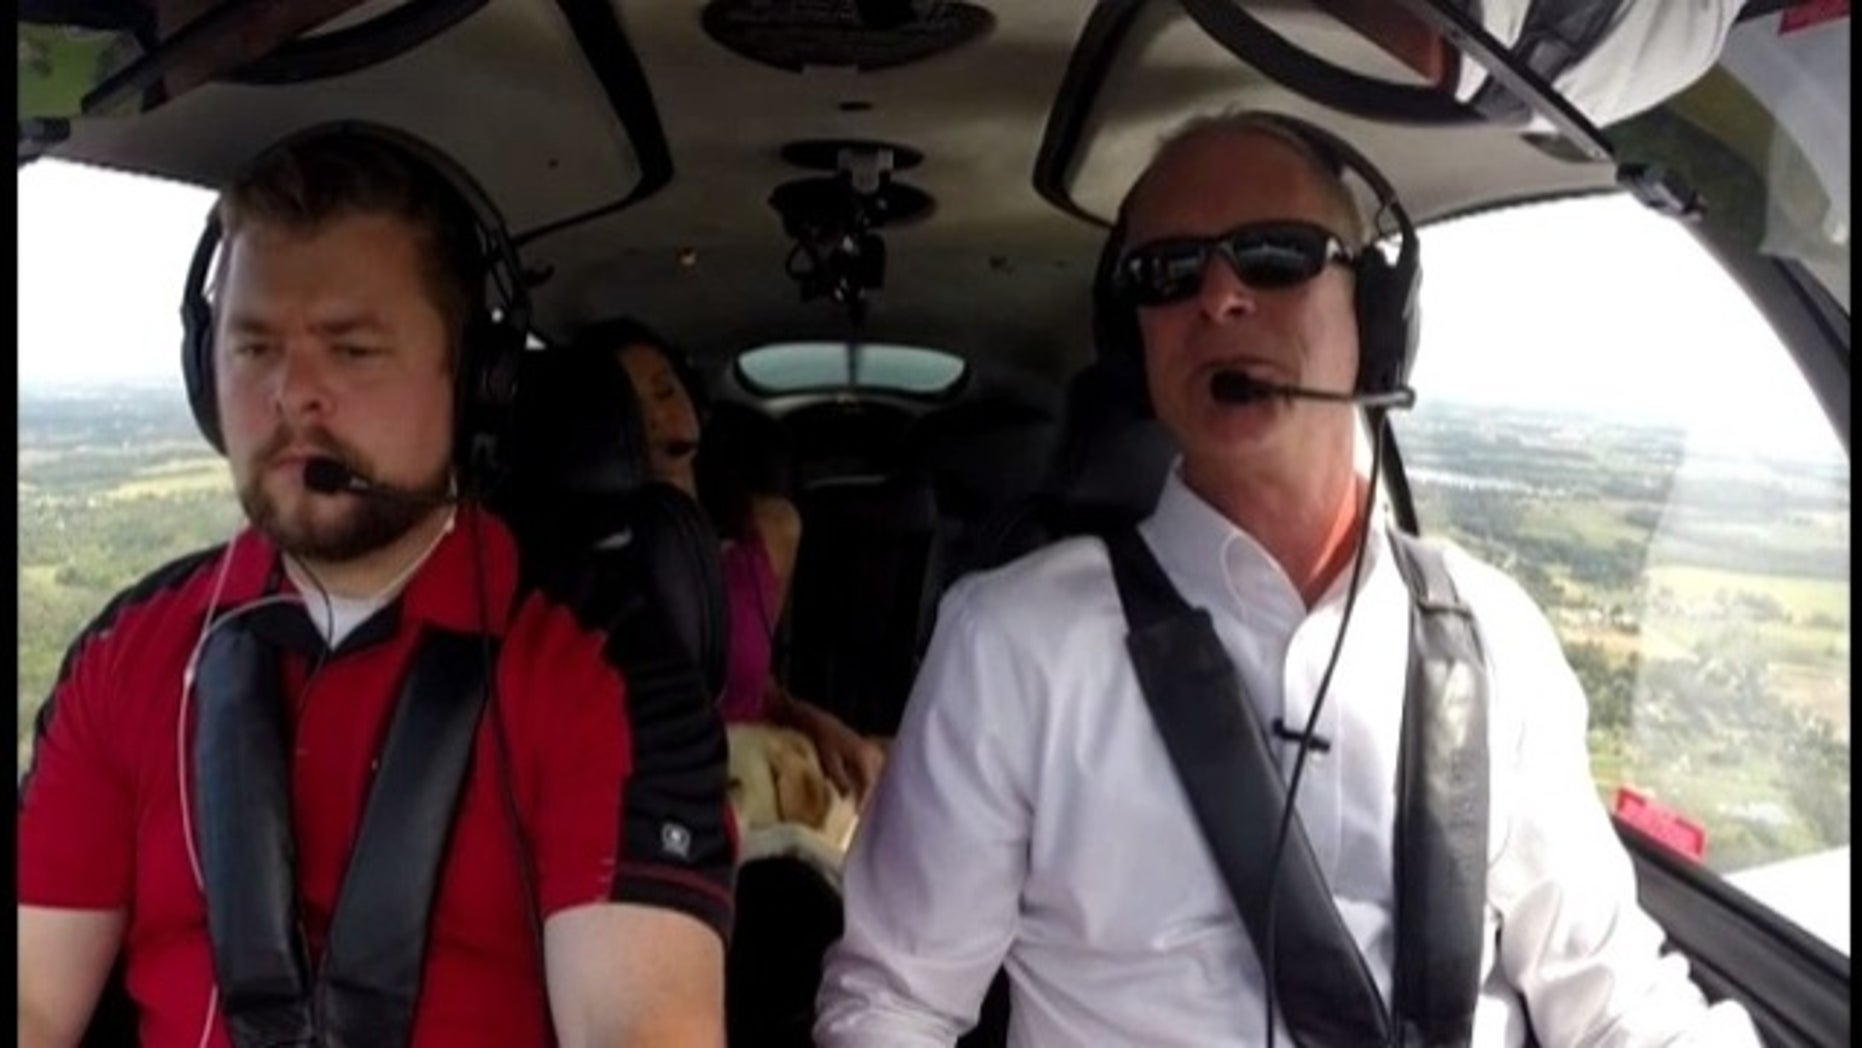 Jim Platzer, right, flies planes despite losing 95 percent of his vision.